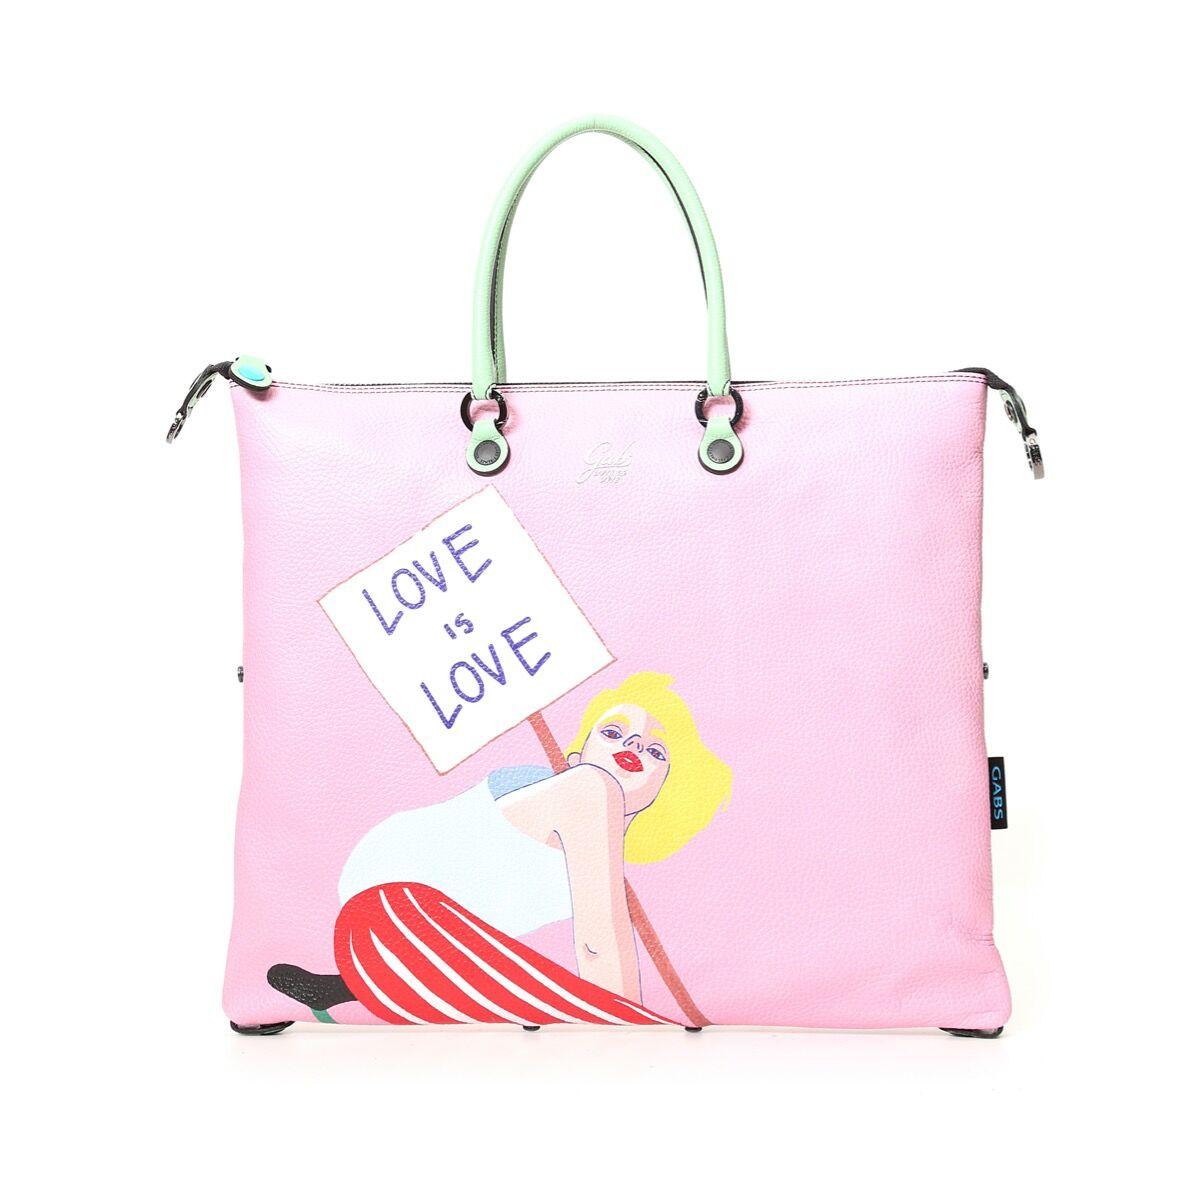 Gabs Borsa Donna a Mano G3 Super Trasformabile in Pelle stampa Love is Love Medium